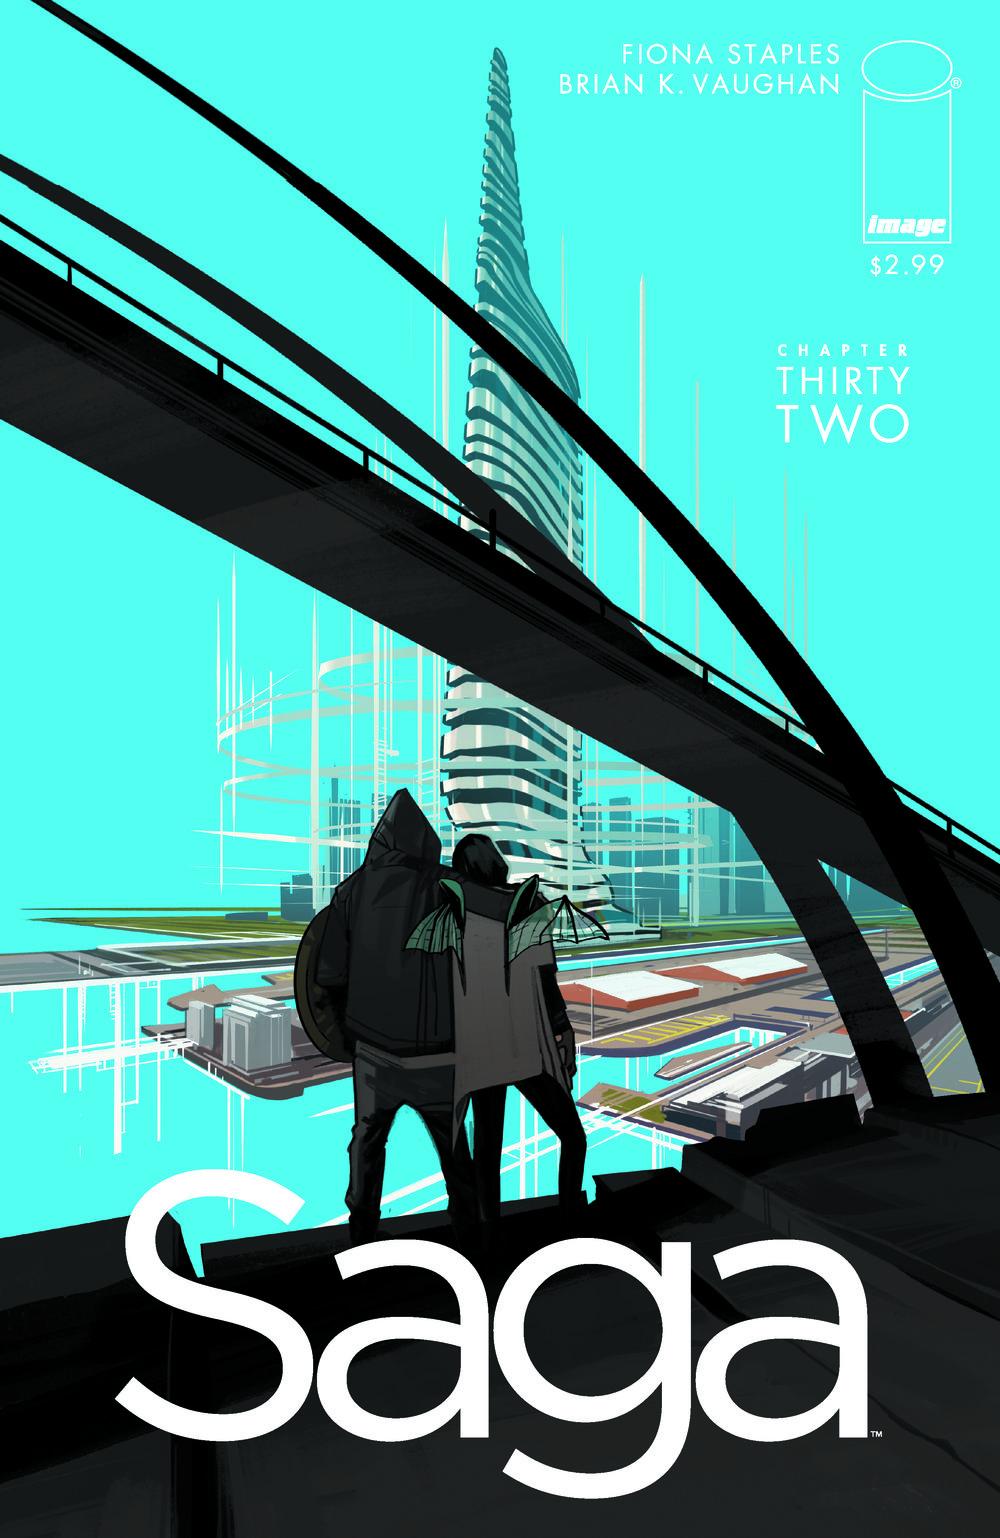 Saga #32  first debuted on 12/23/2015.